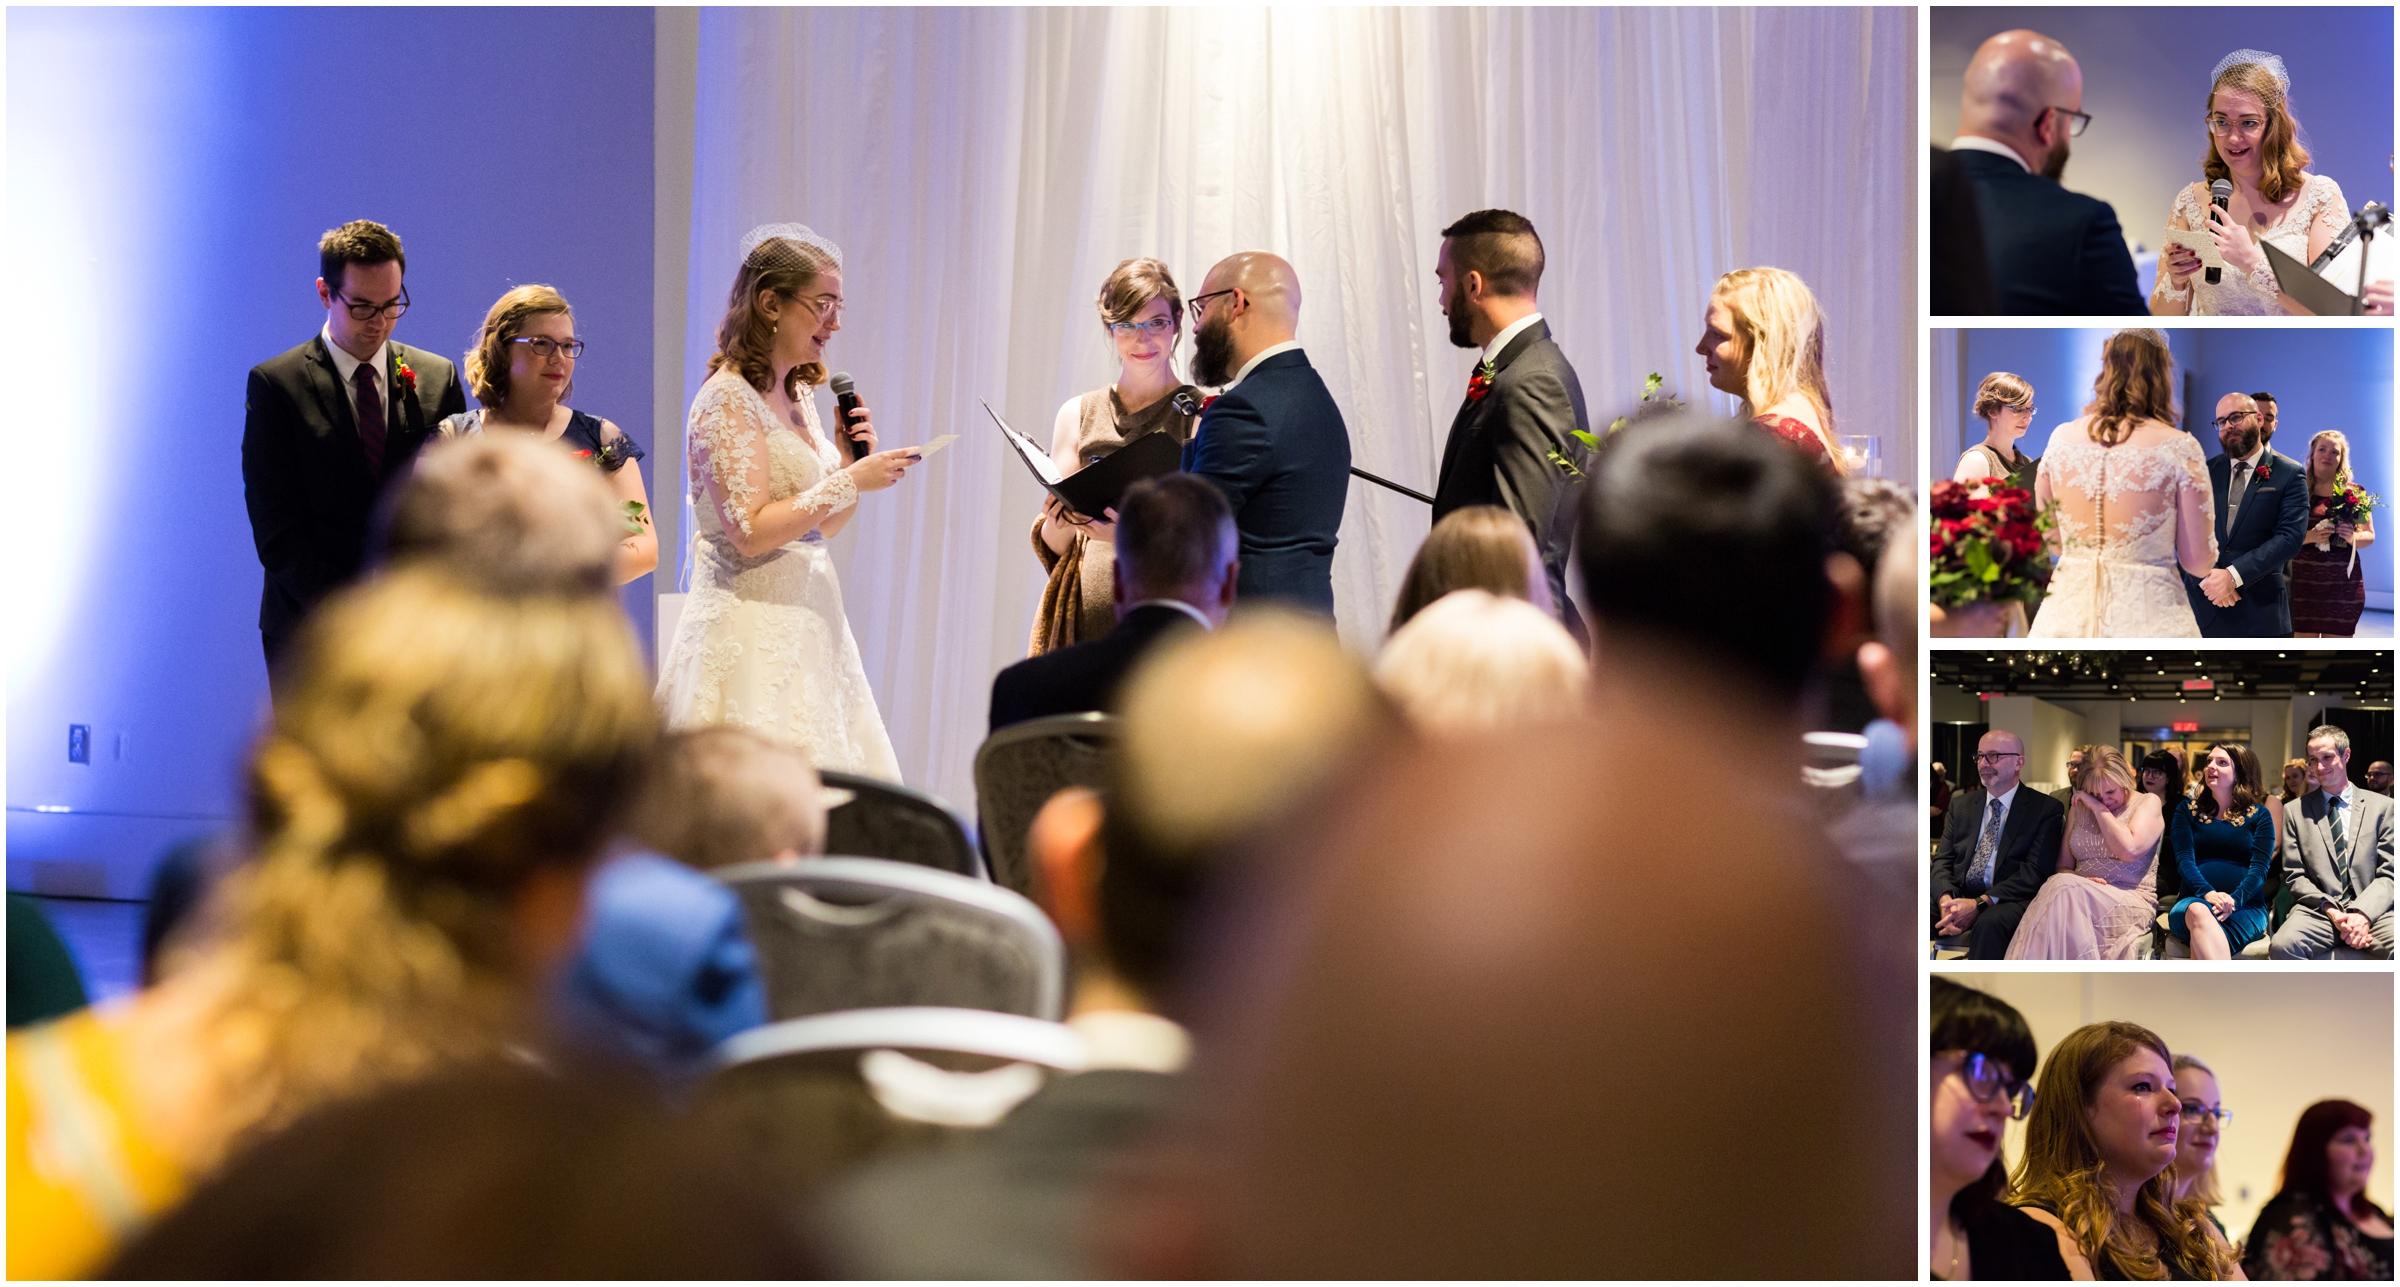 Ottaw Wedding Allison Andrew - (Selena Phillips-Boyle)_0073.jpg